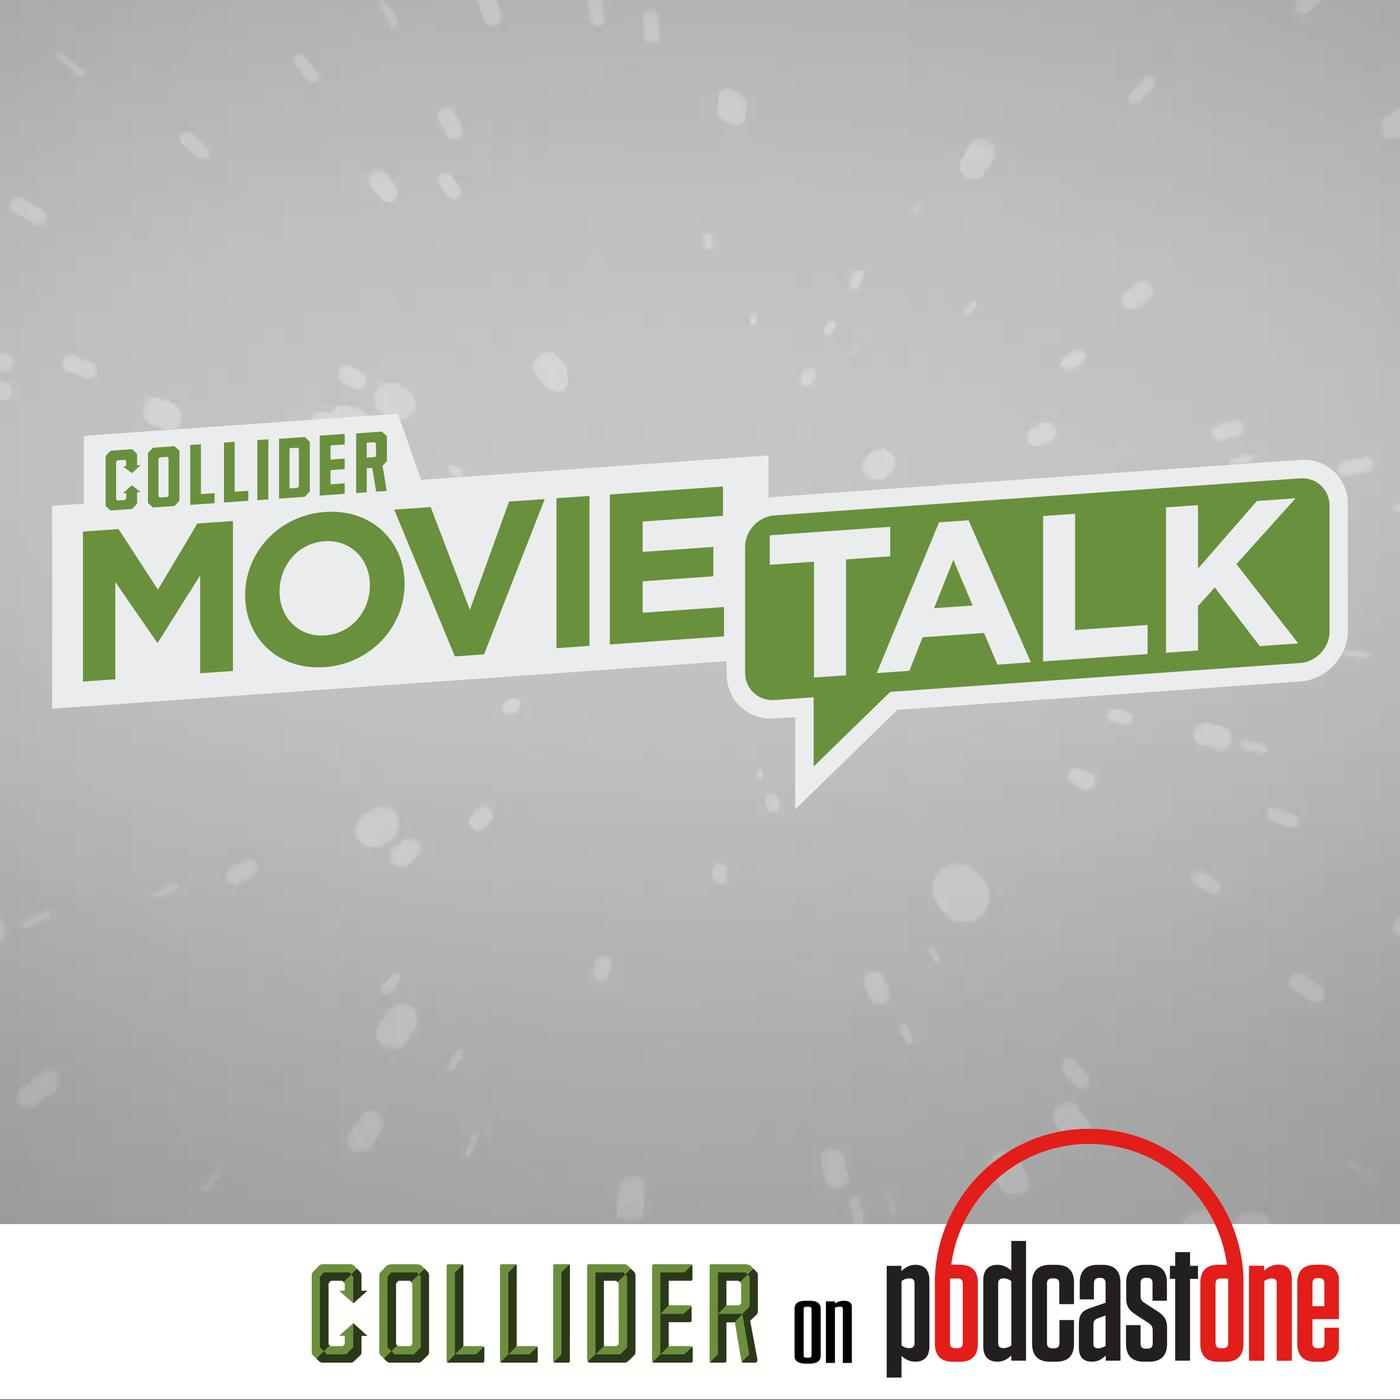 Collider Movie Talk (podcast) - PodcastOne | Listen Notes